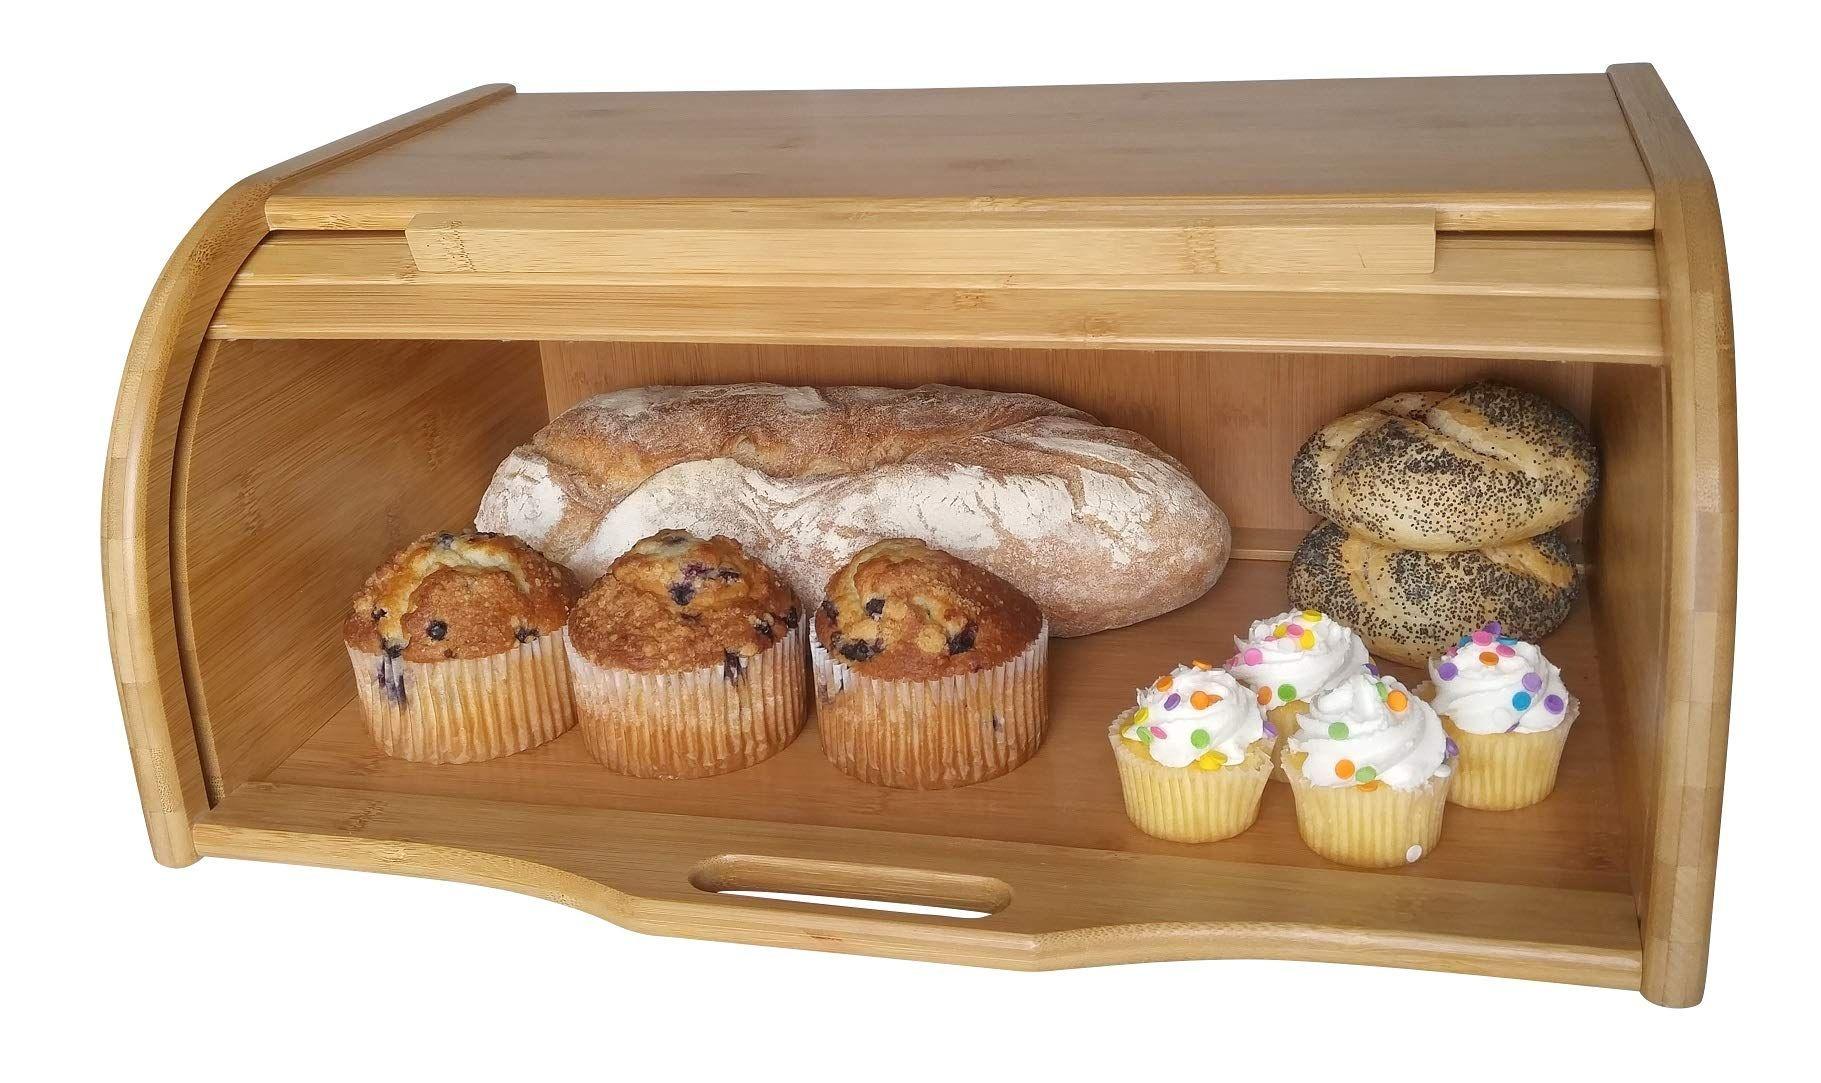 Large Bread Box Bread Basket Wooden Box Storage Boxes Kitchen